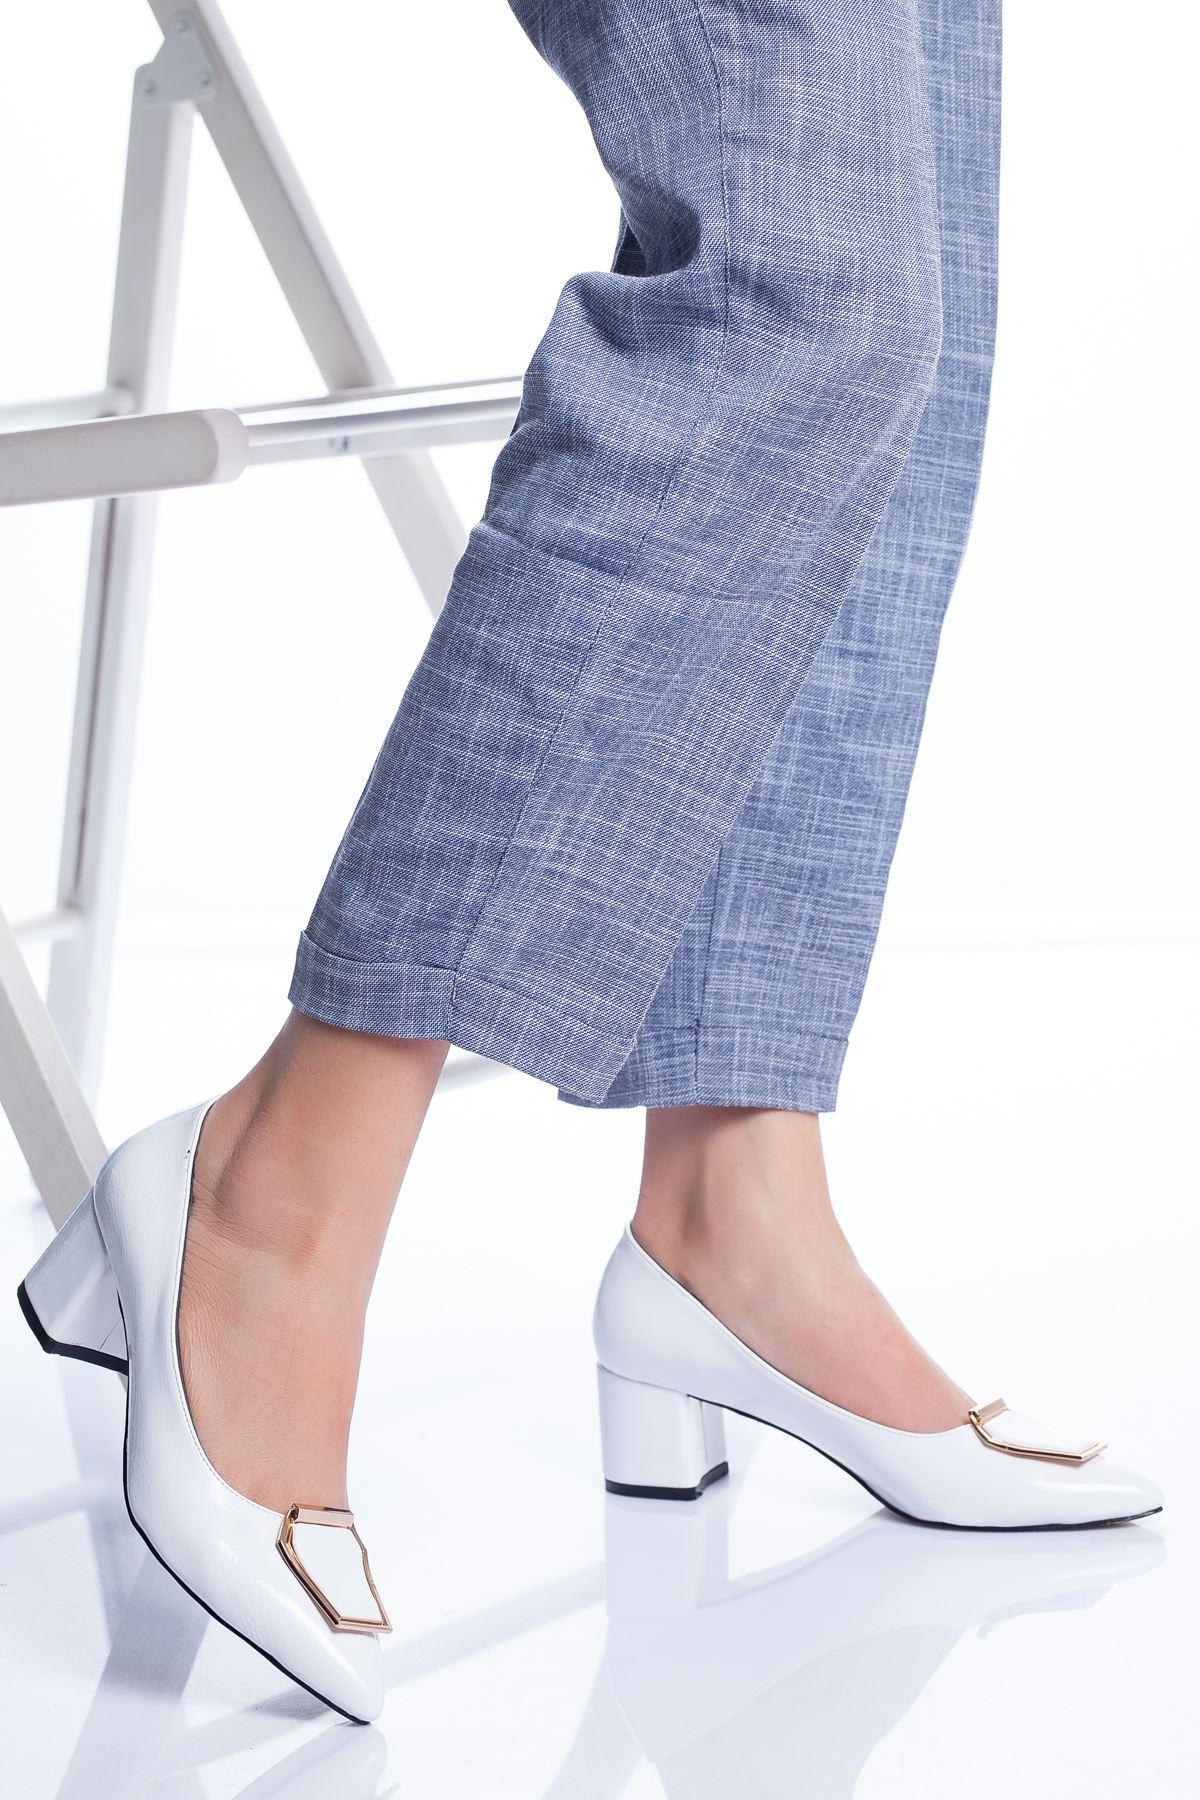 Della Topuklu Ayakkabı BEYAZ RUGAN